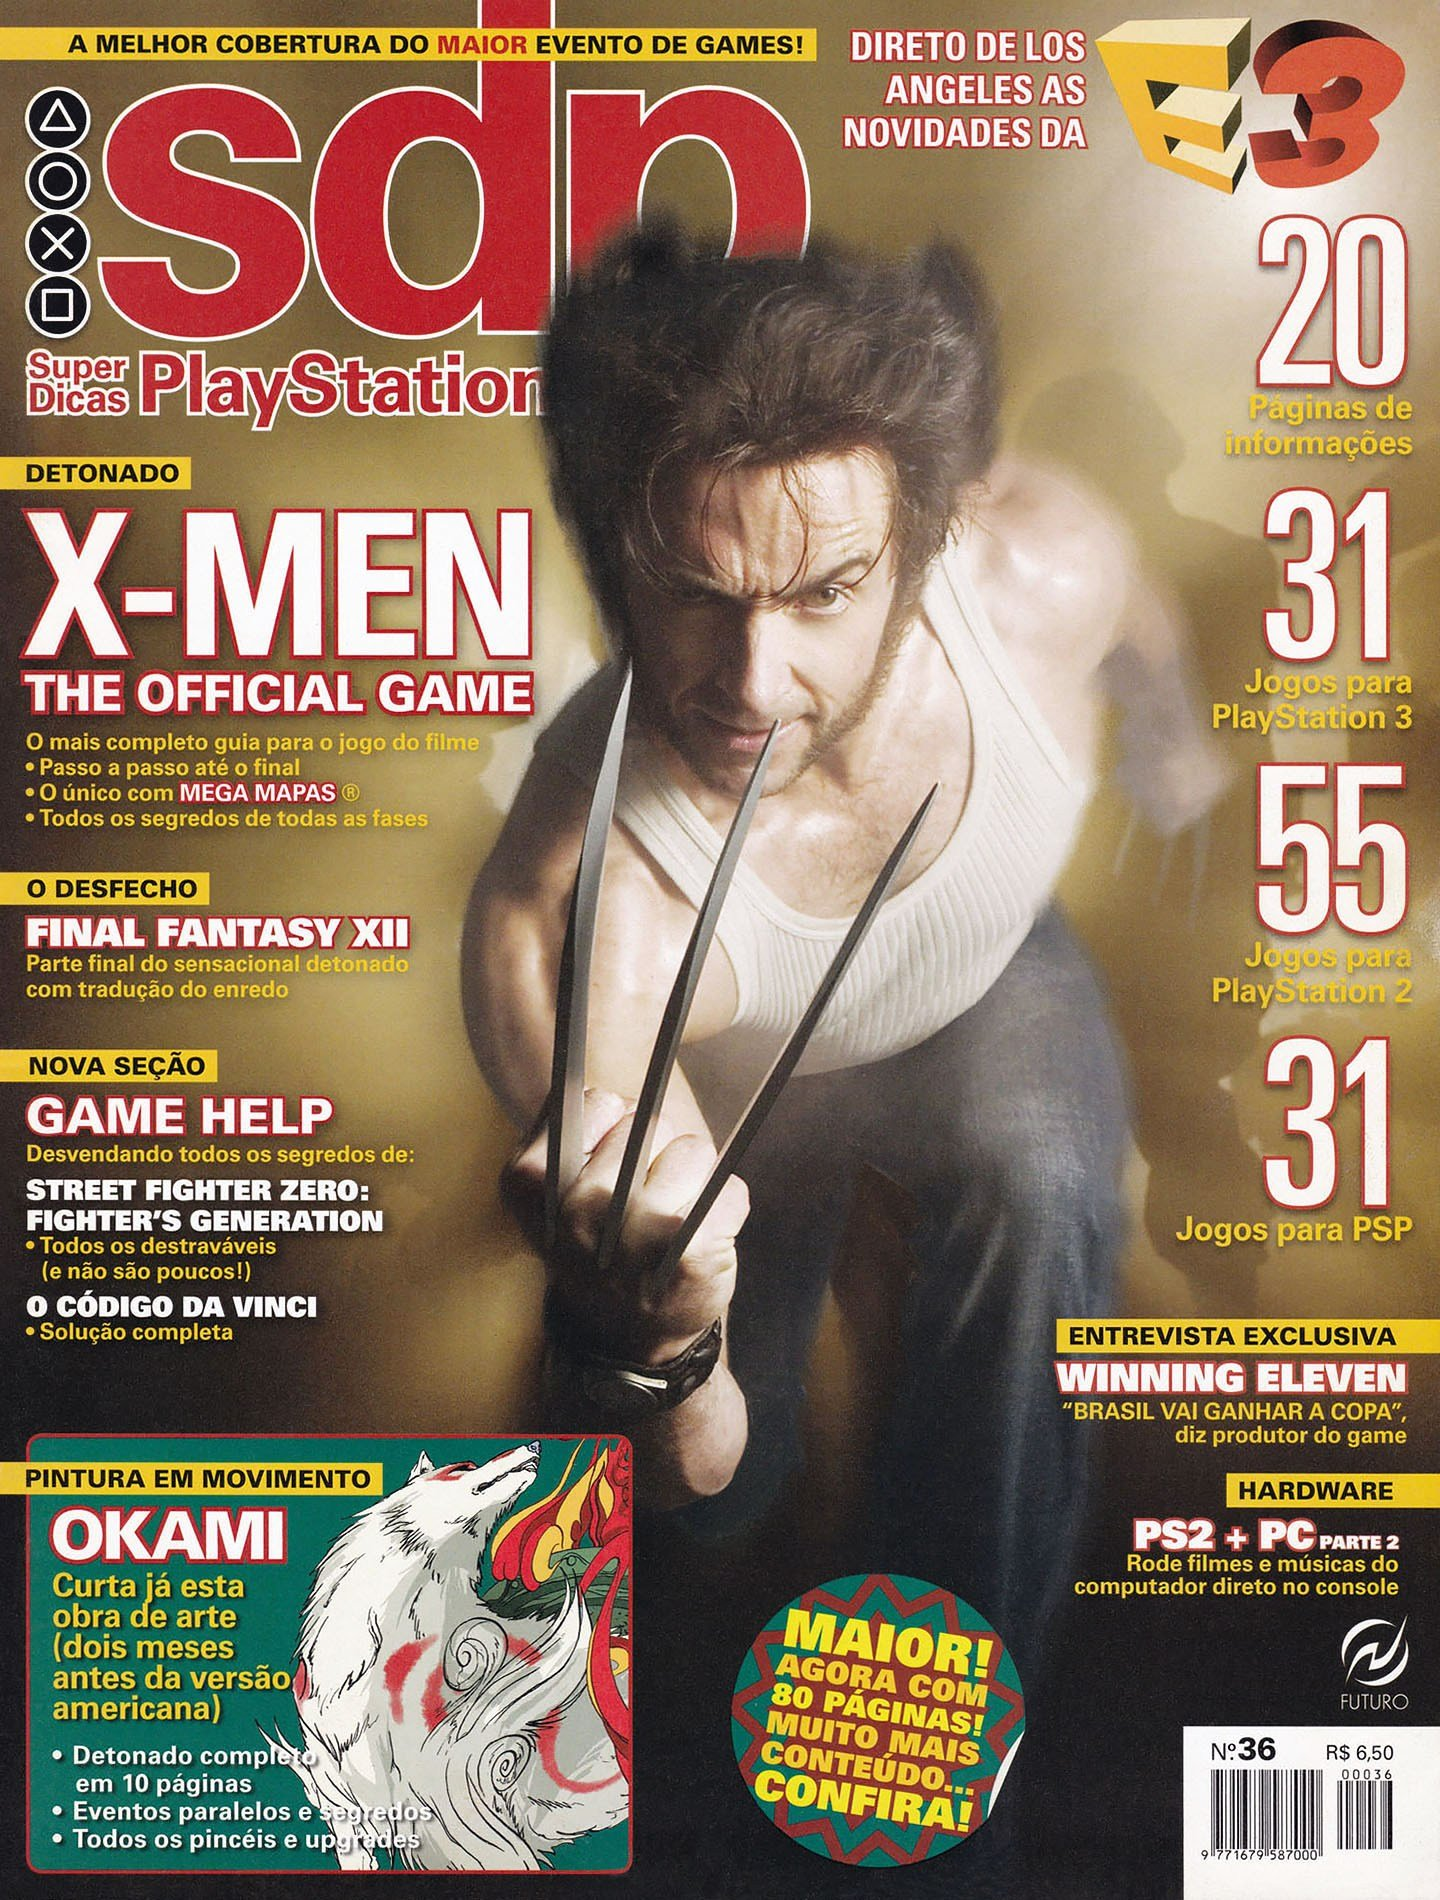 Super Dicas Playstation 36 (July 2006)